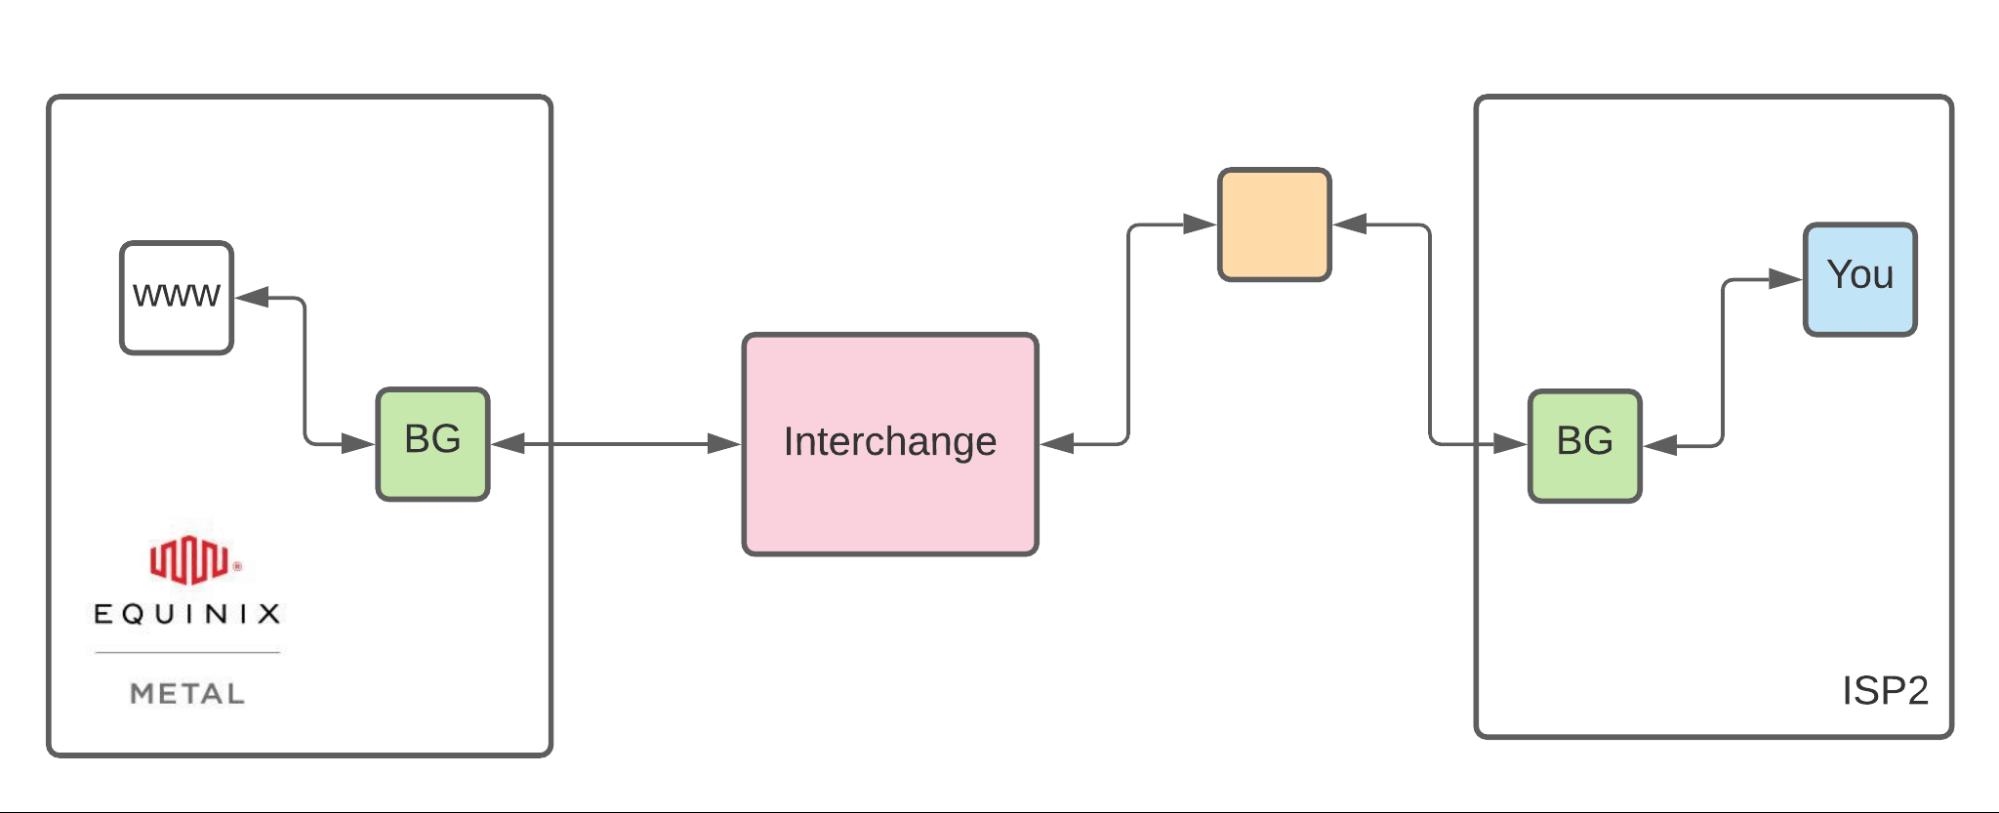 Equinix Metal network latency diagram